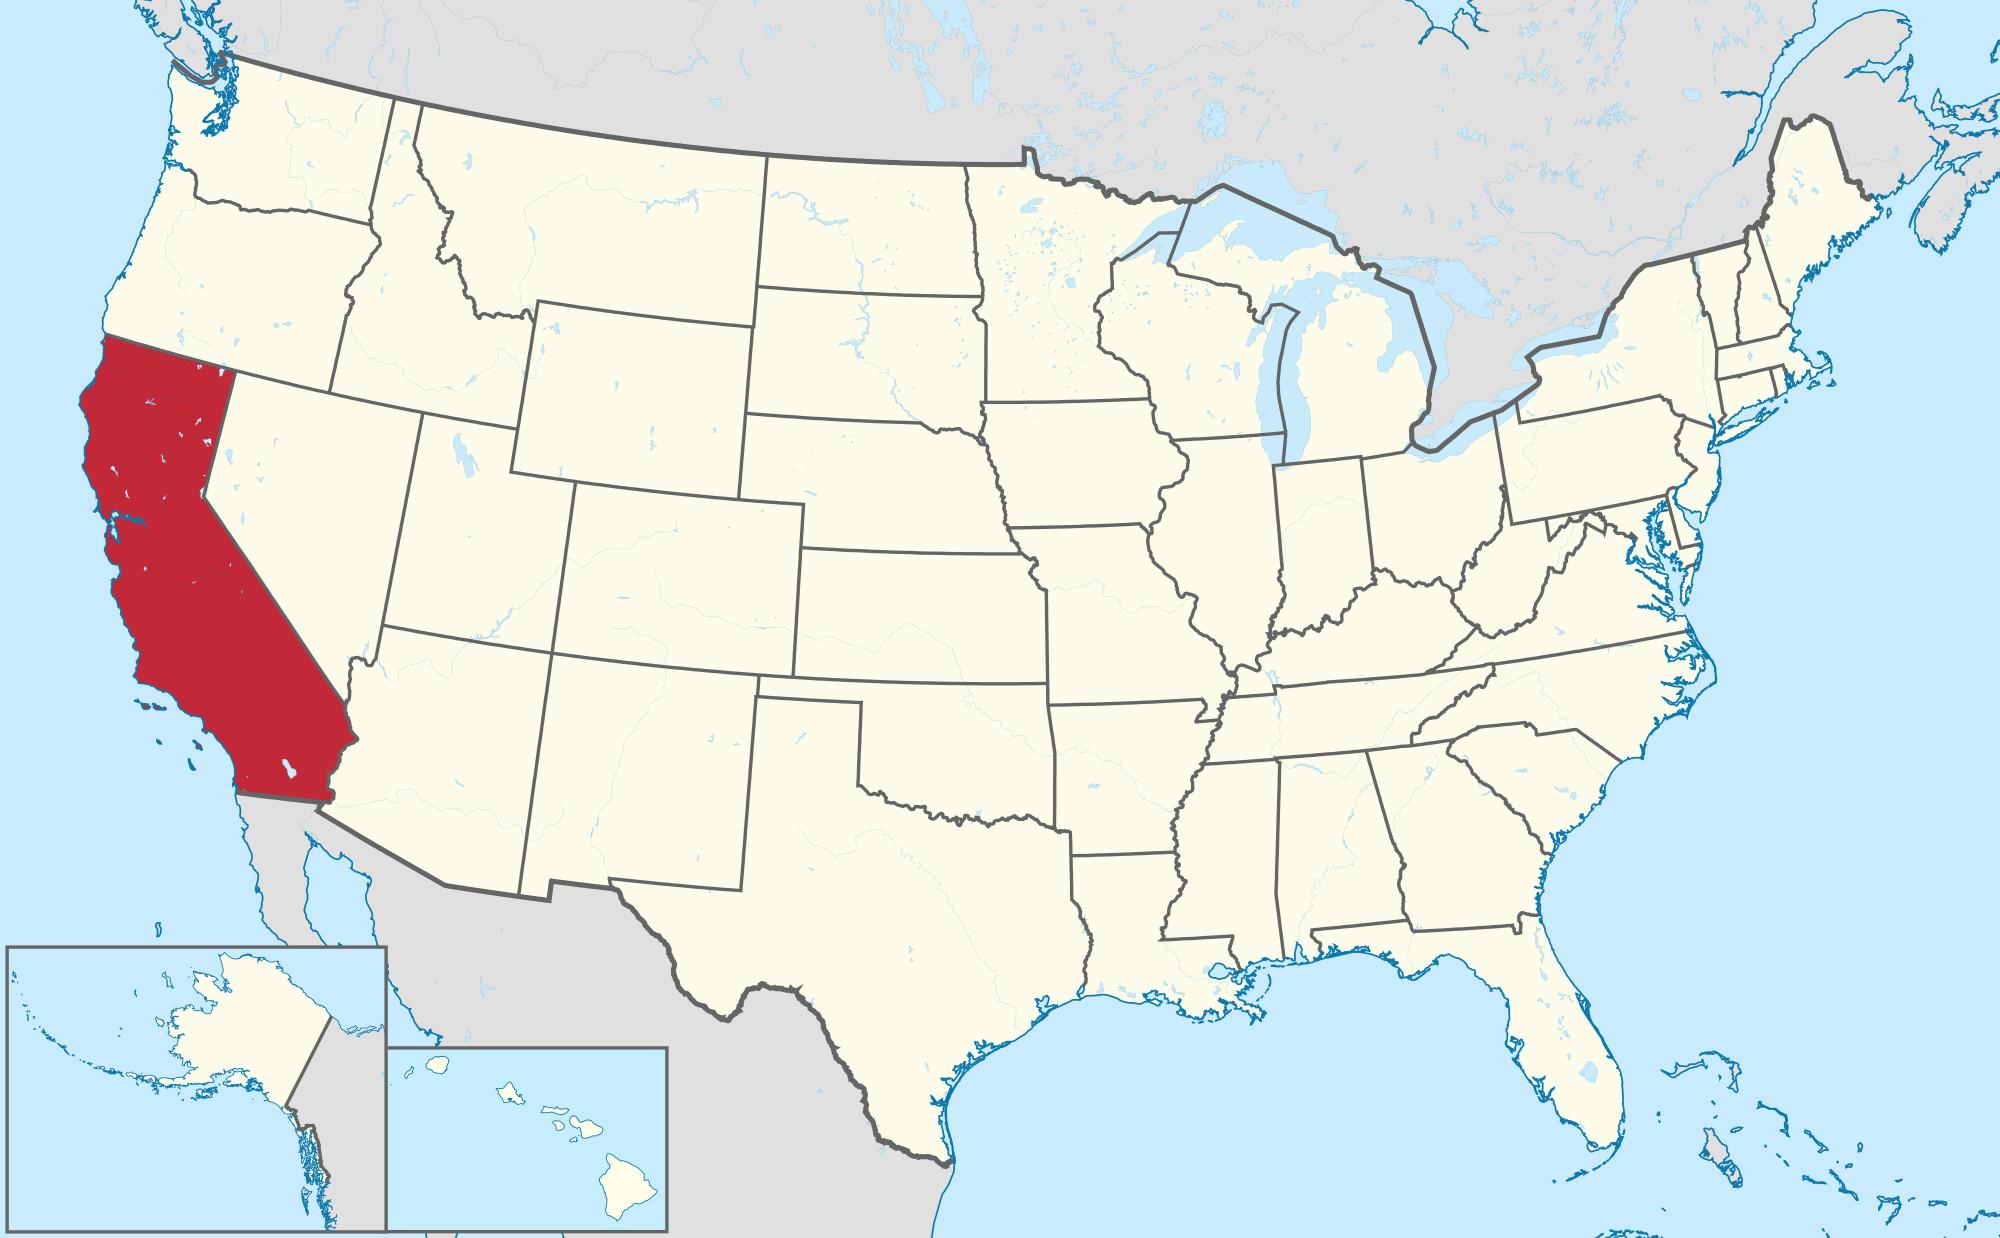 Rancho Cucamonga California Map Fresh List Of Cities And Towns In - Rancho Cucamonga California Map